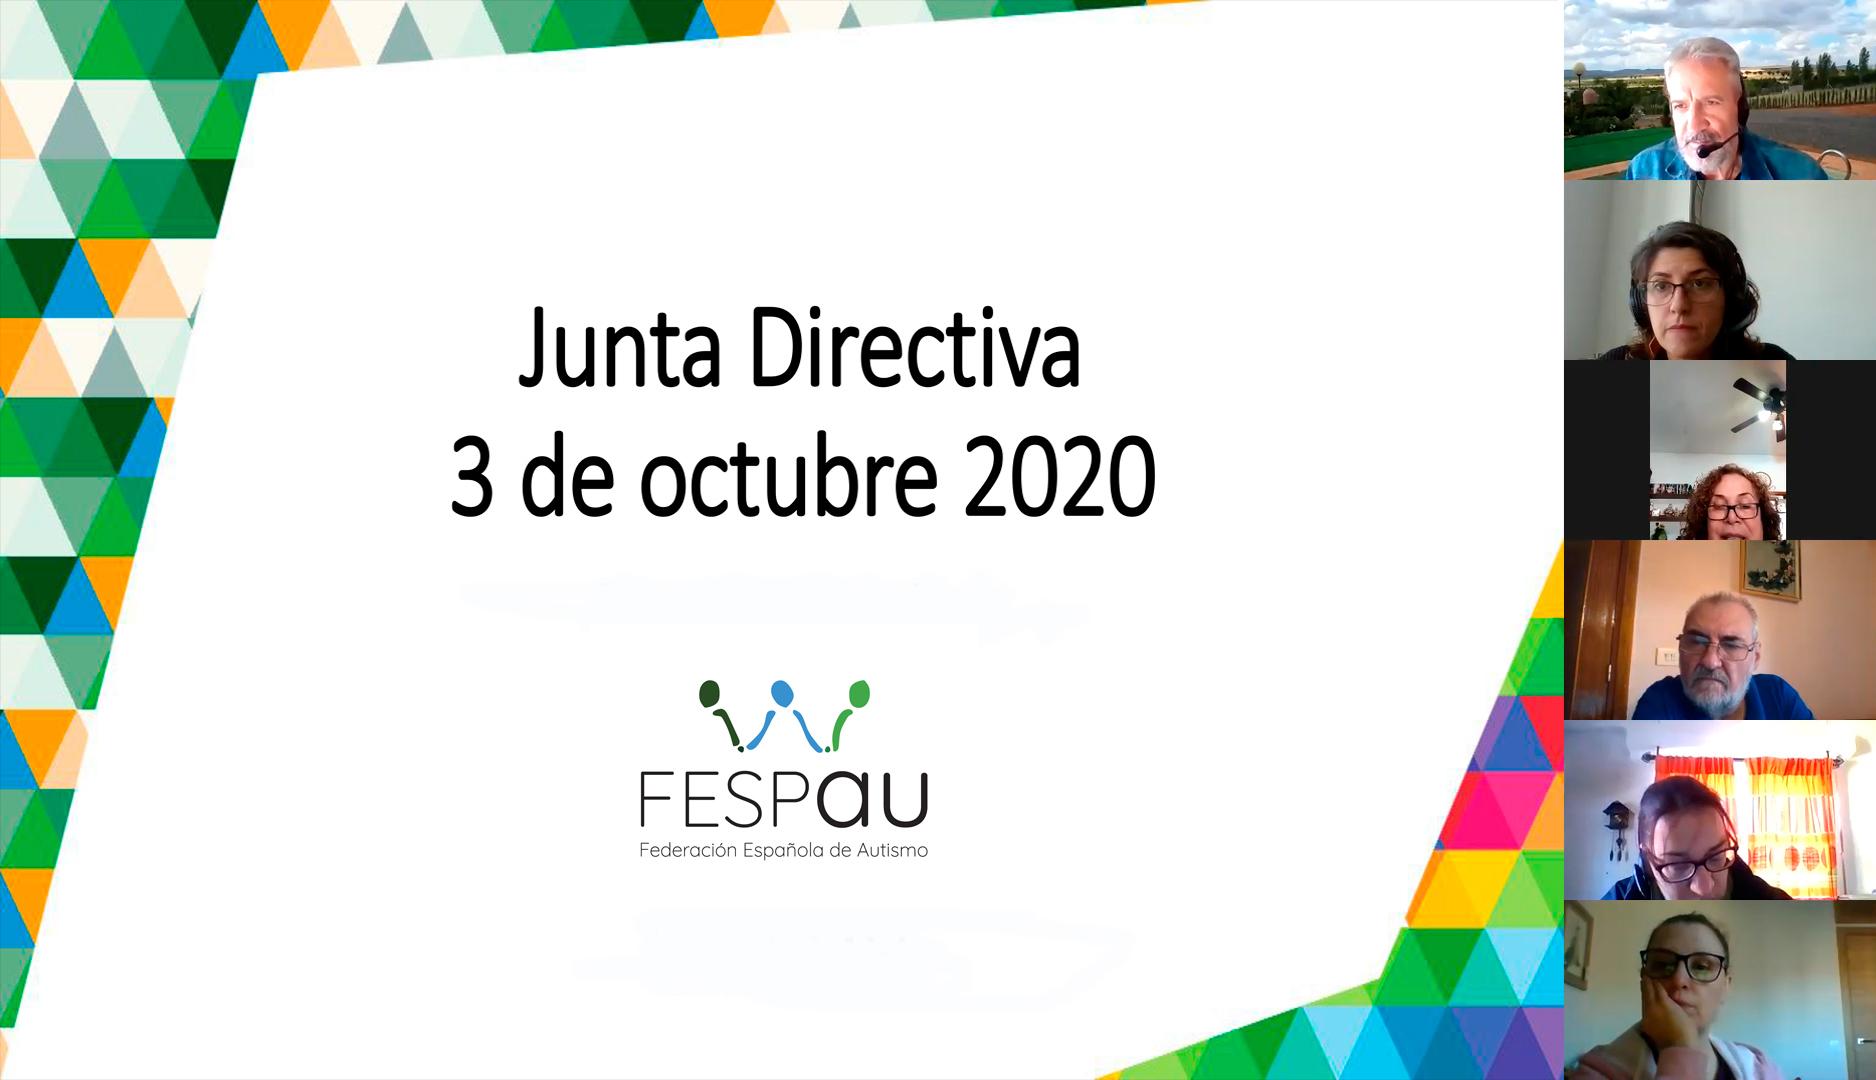 Junta Directiva 3/10/20